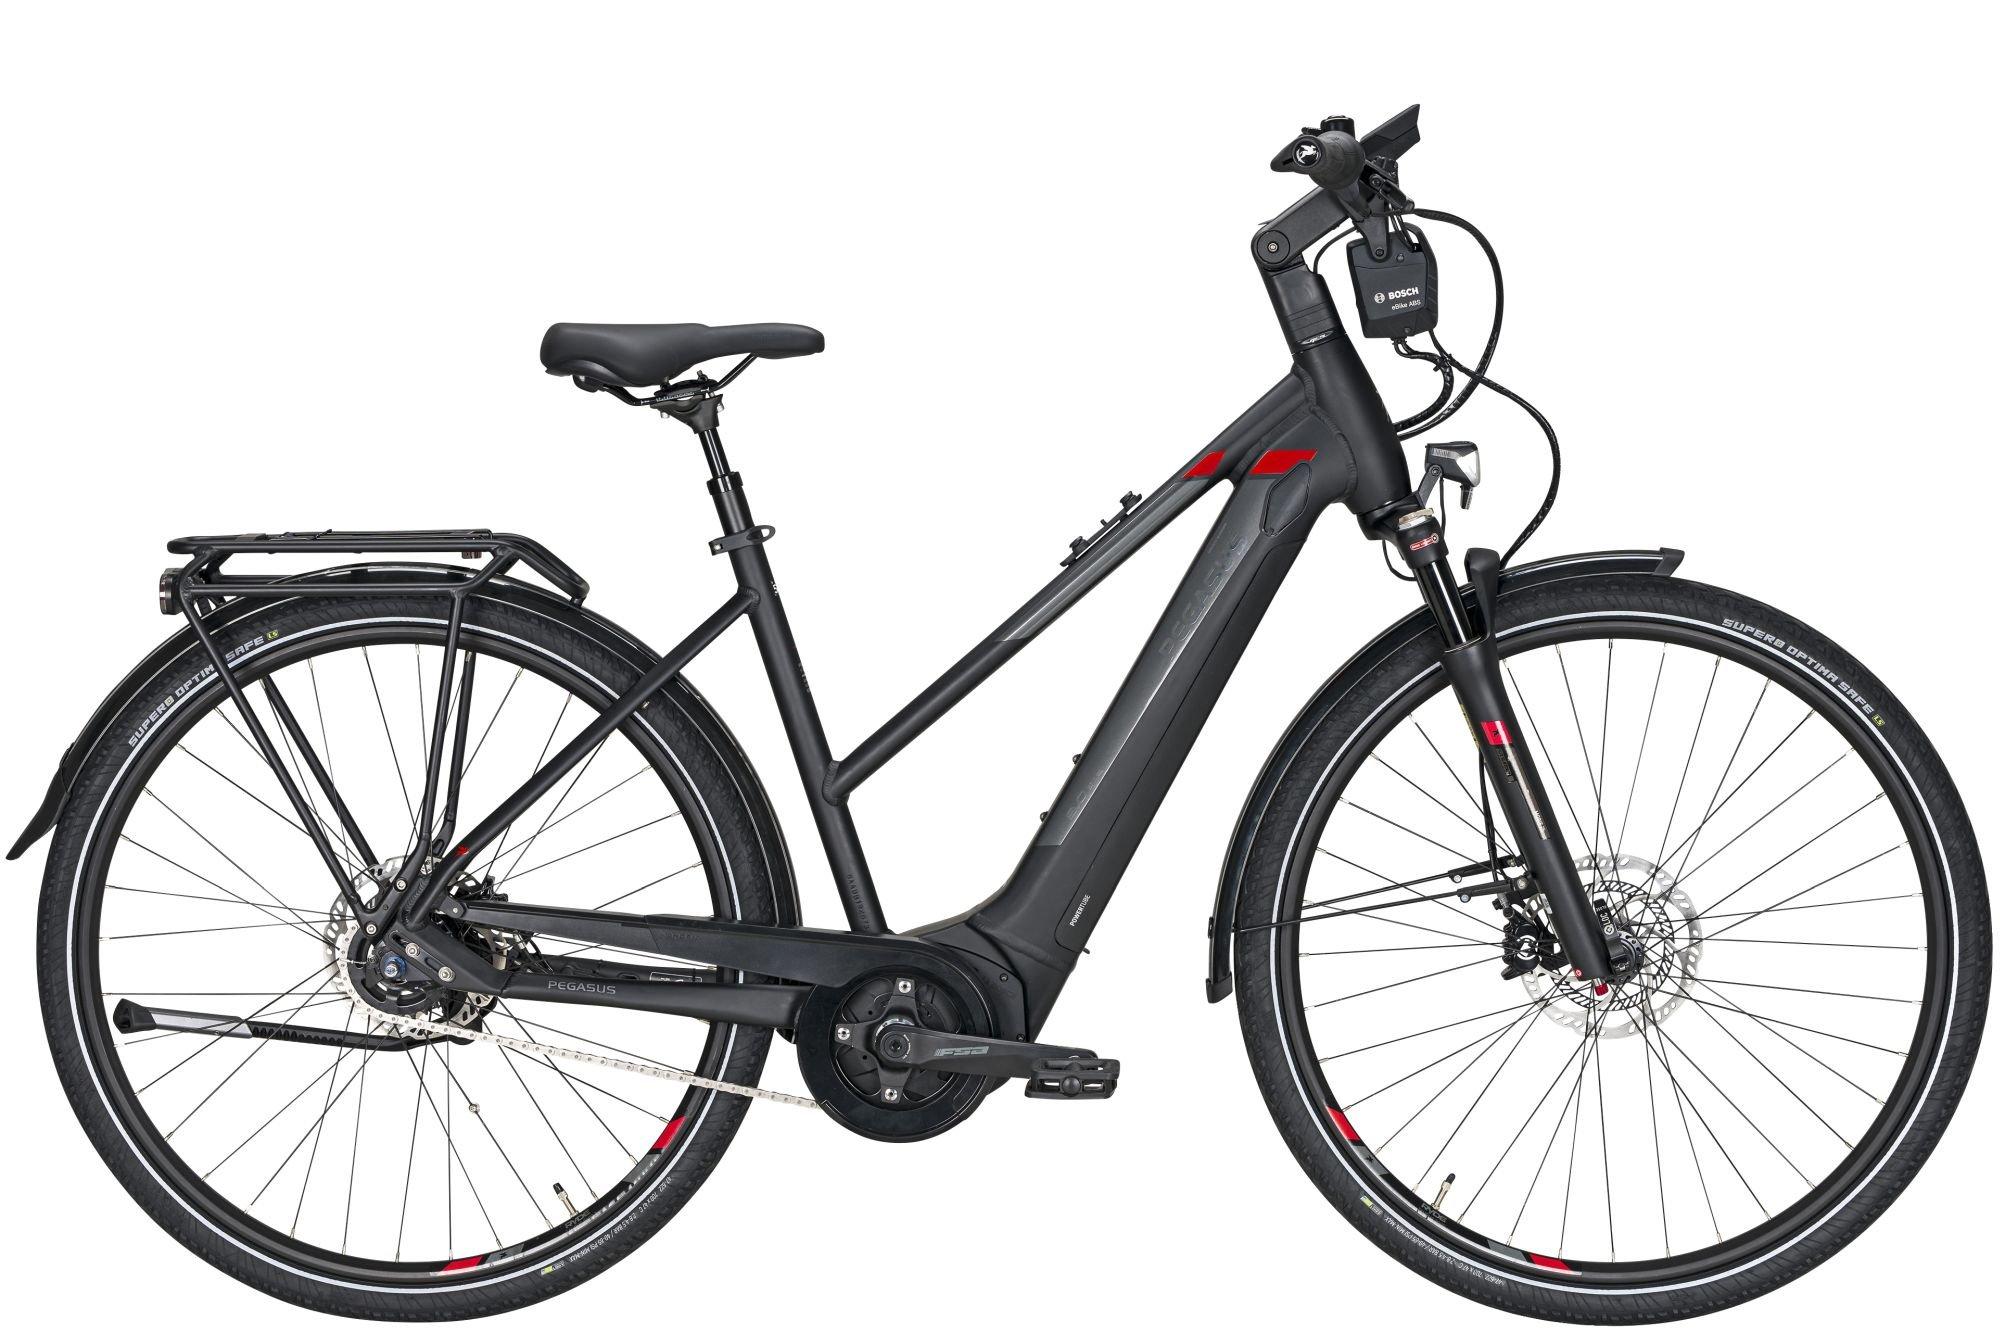 E-Bikes: Pegasus  Premio Evo 5F ABS (500 Wh) 5 Gang Nabenschaltung Damenfahrrad Trapez Modell 2021 28 Zoll 45 cm